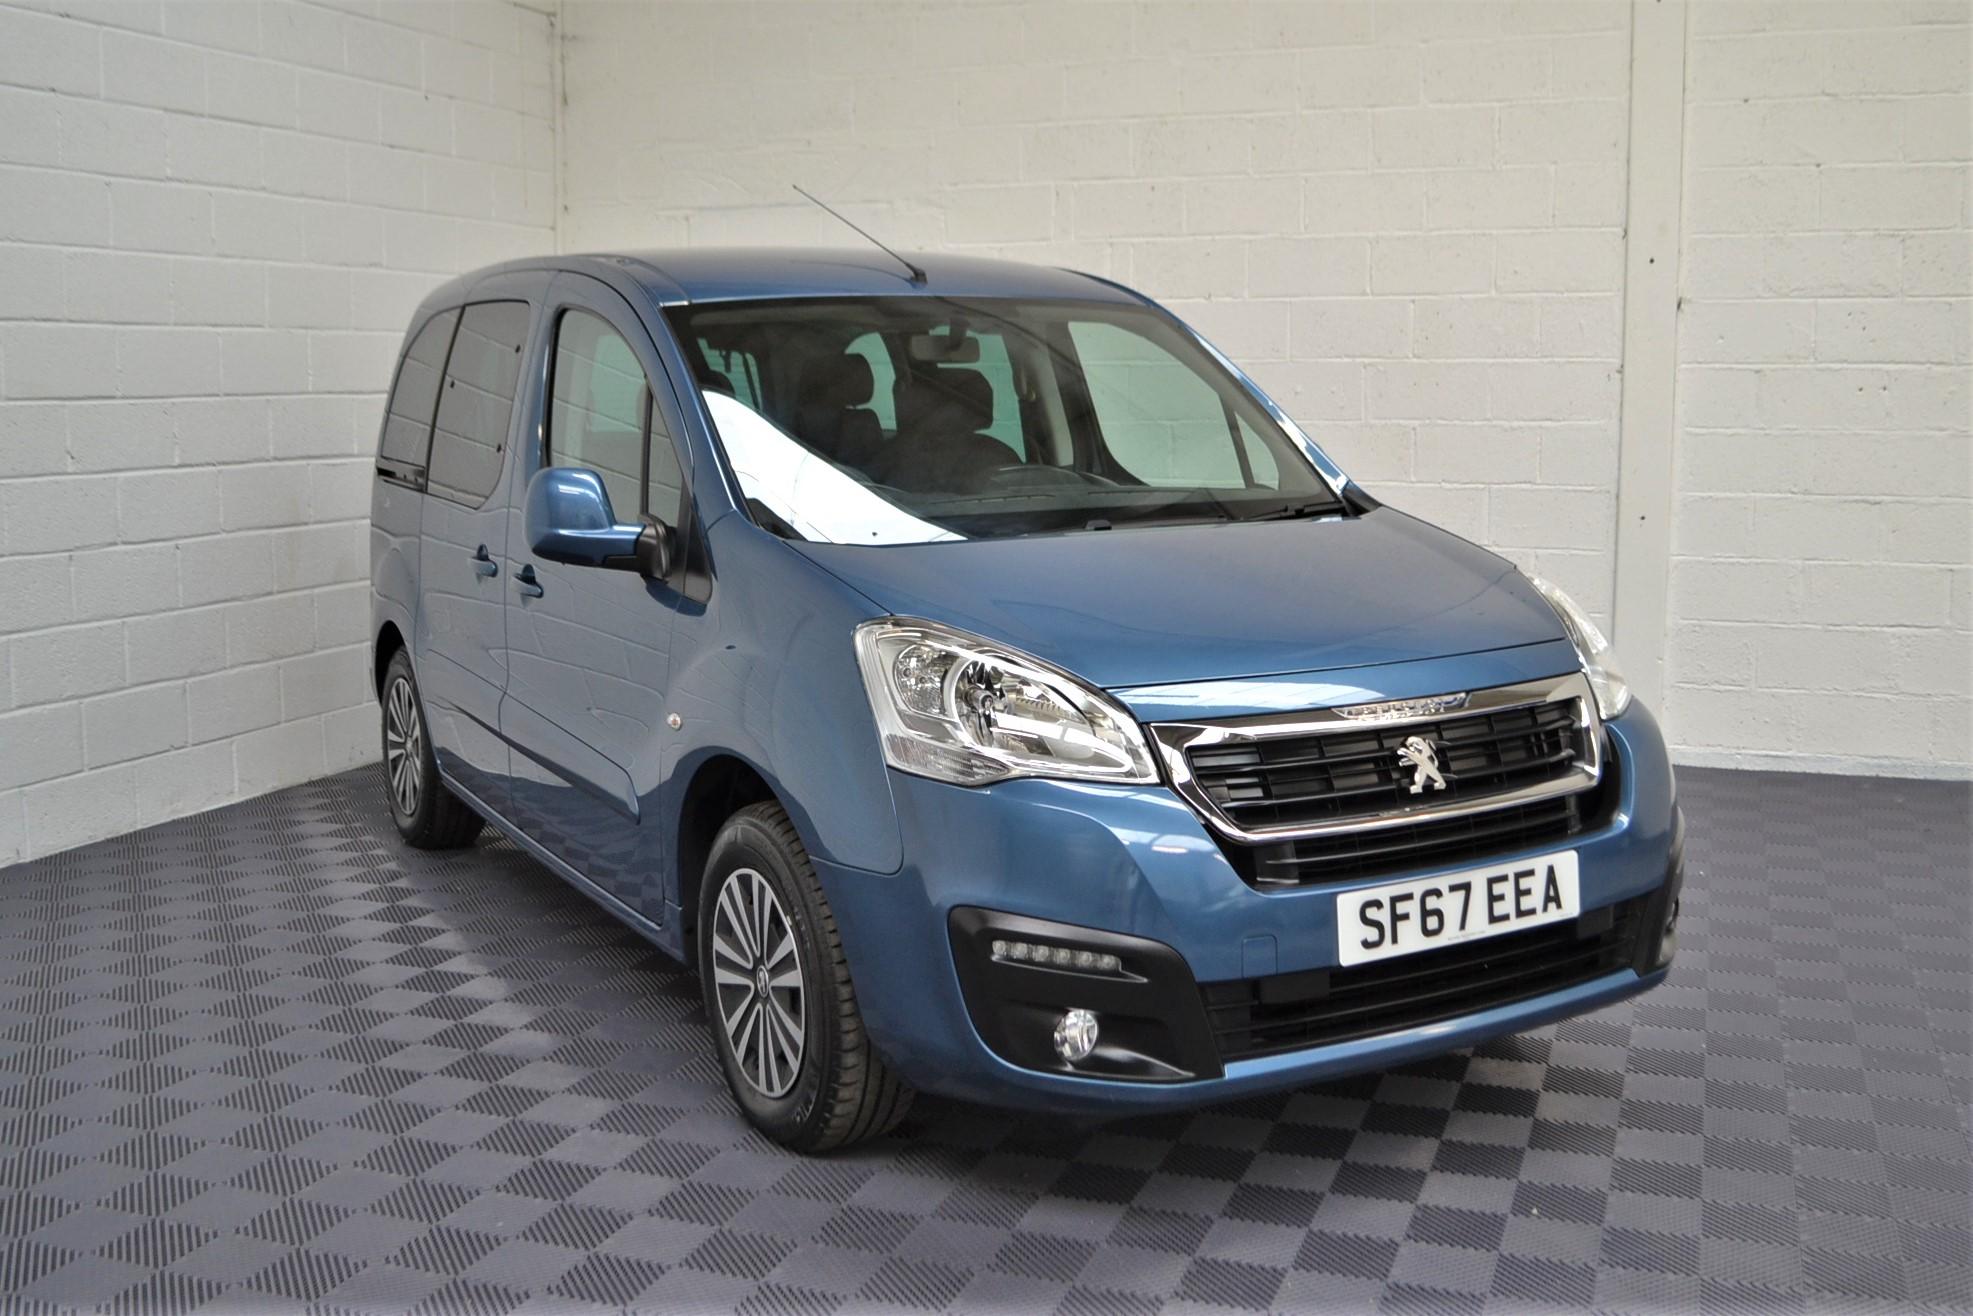 WAV Cars For Sale Bristol Wheelchair Accessible Vehicles Used For Sale Somerset Devon Dorset Bath Peugeot Partner SF67 EEA 20